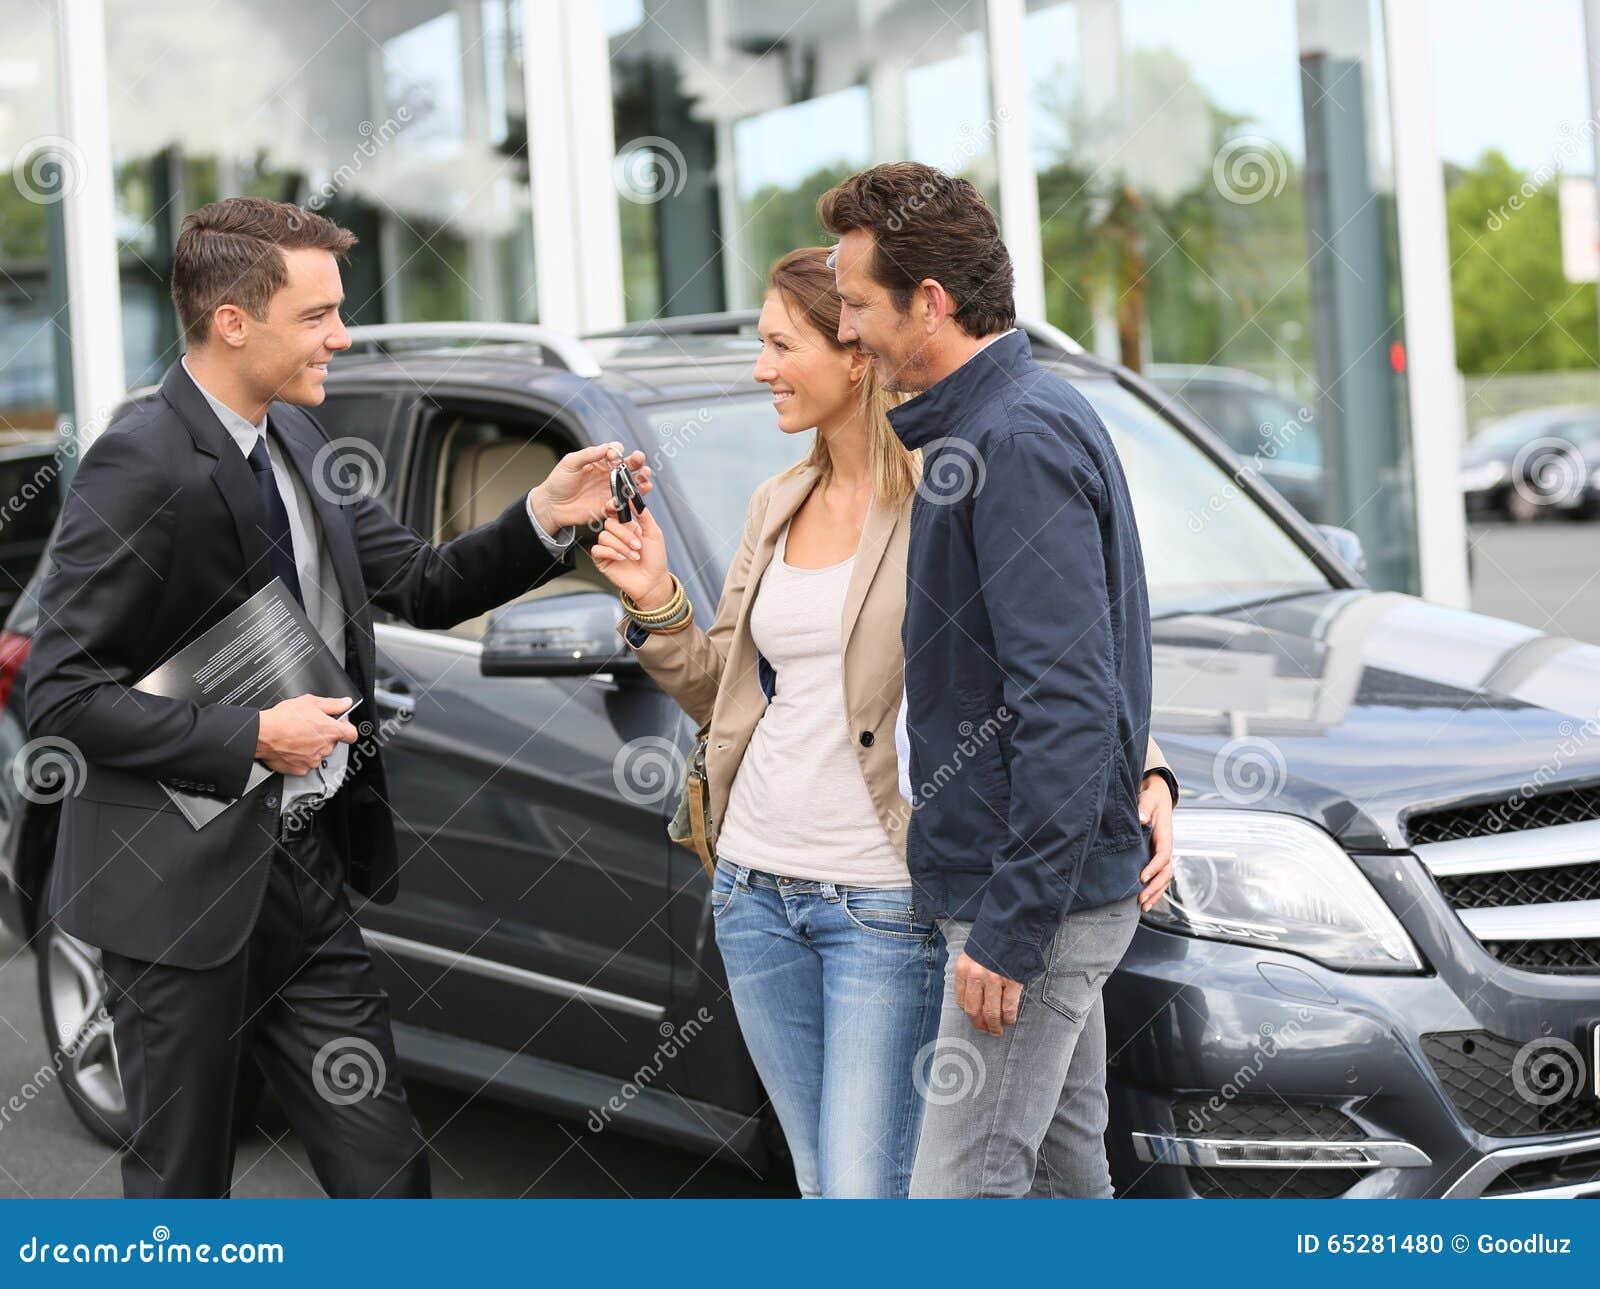 Salesman handing keys of new car to happy clients